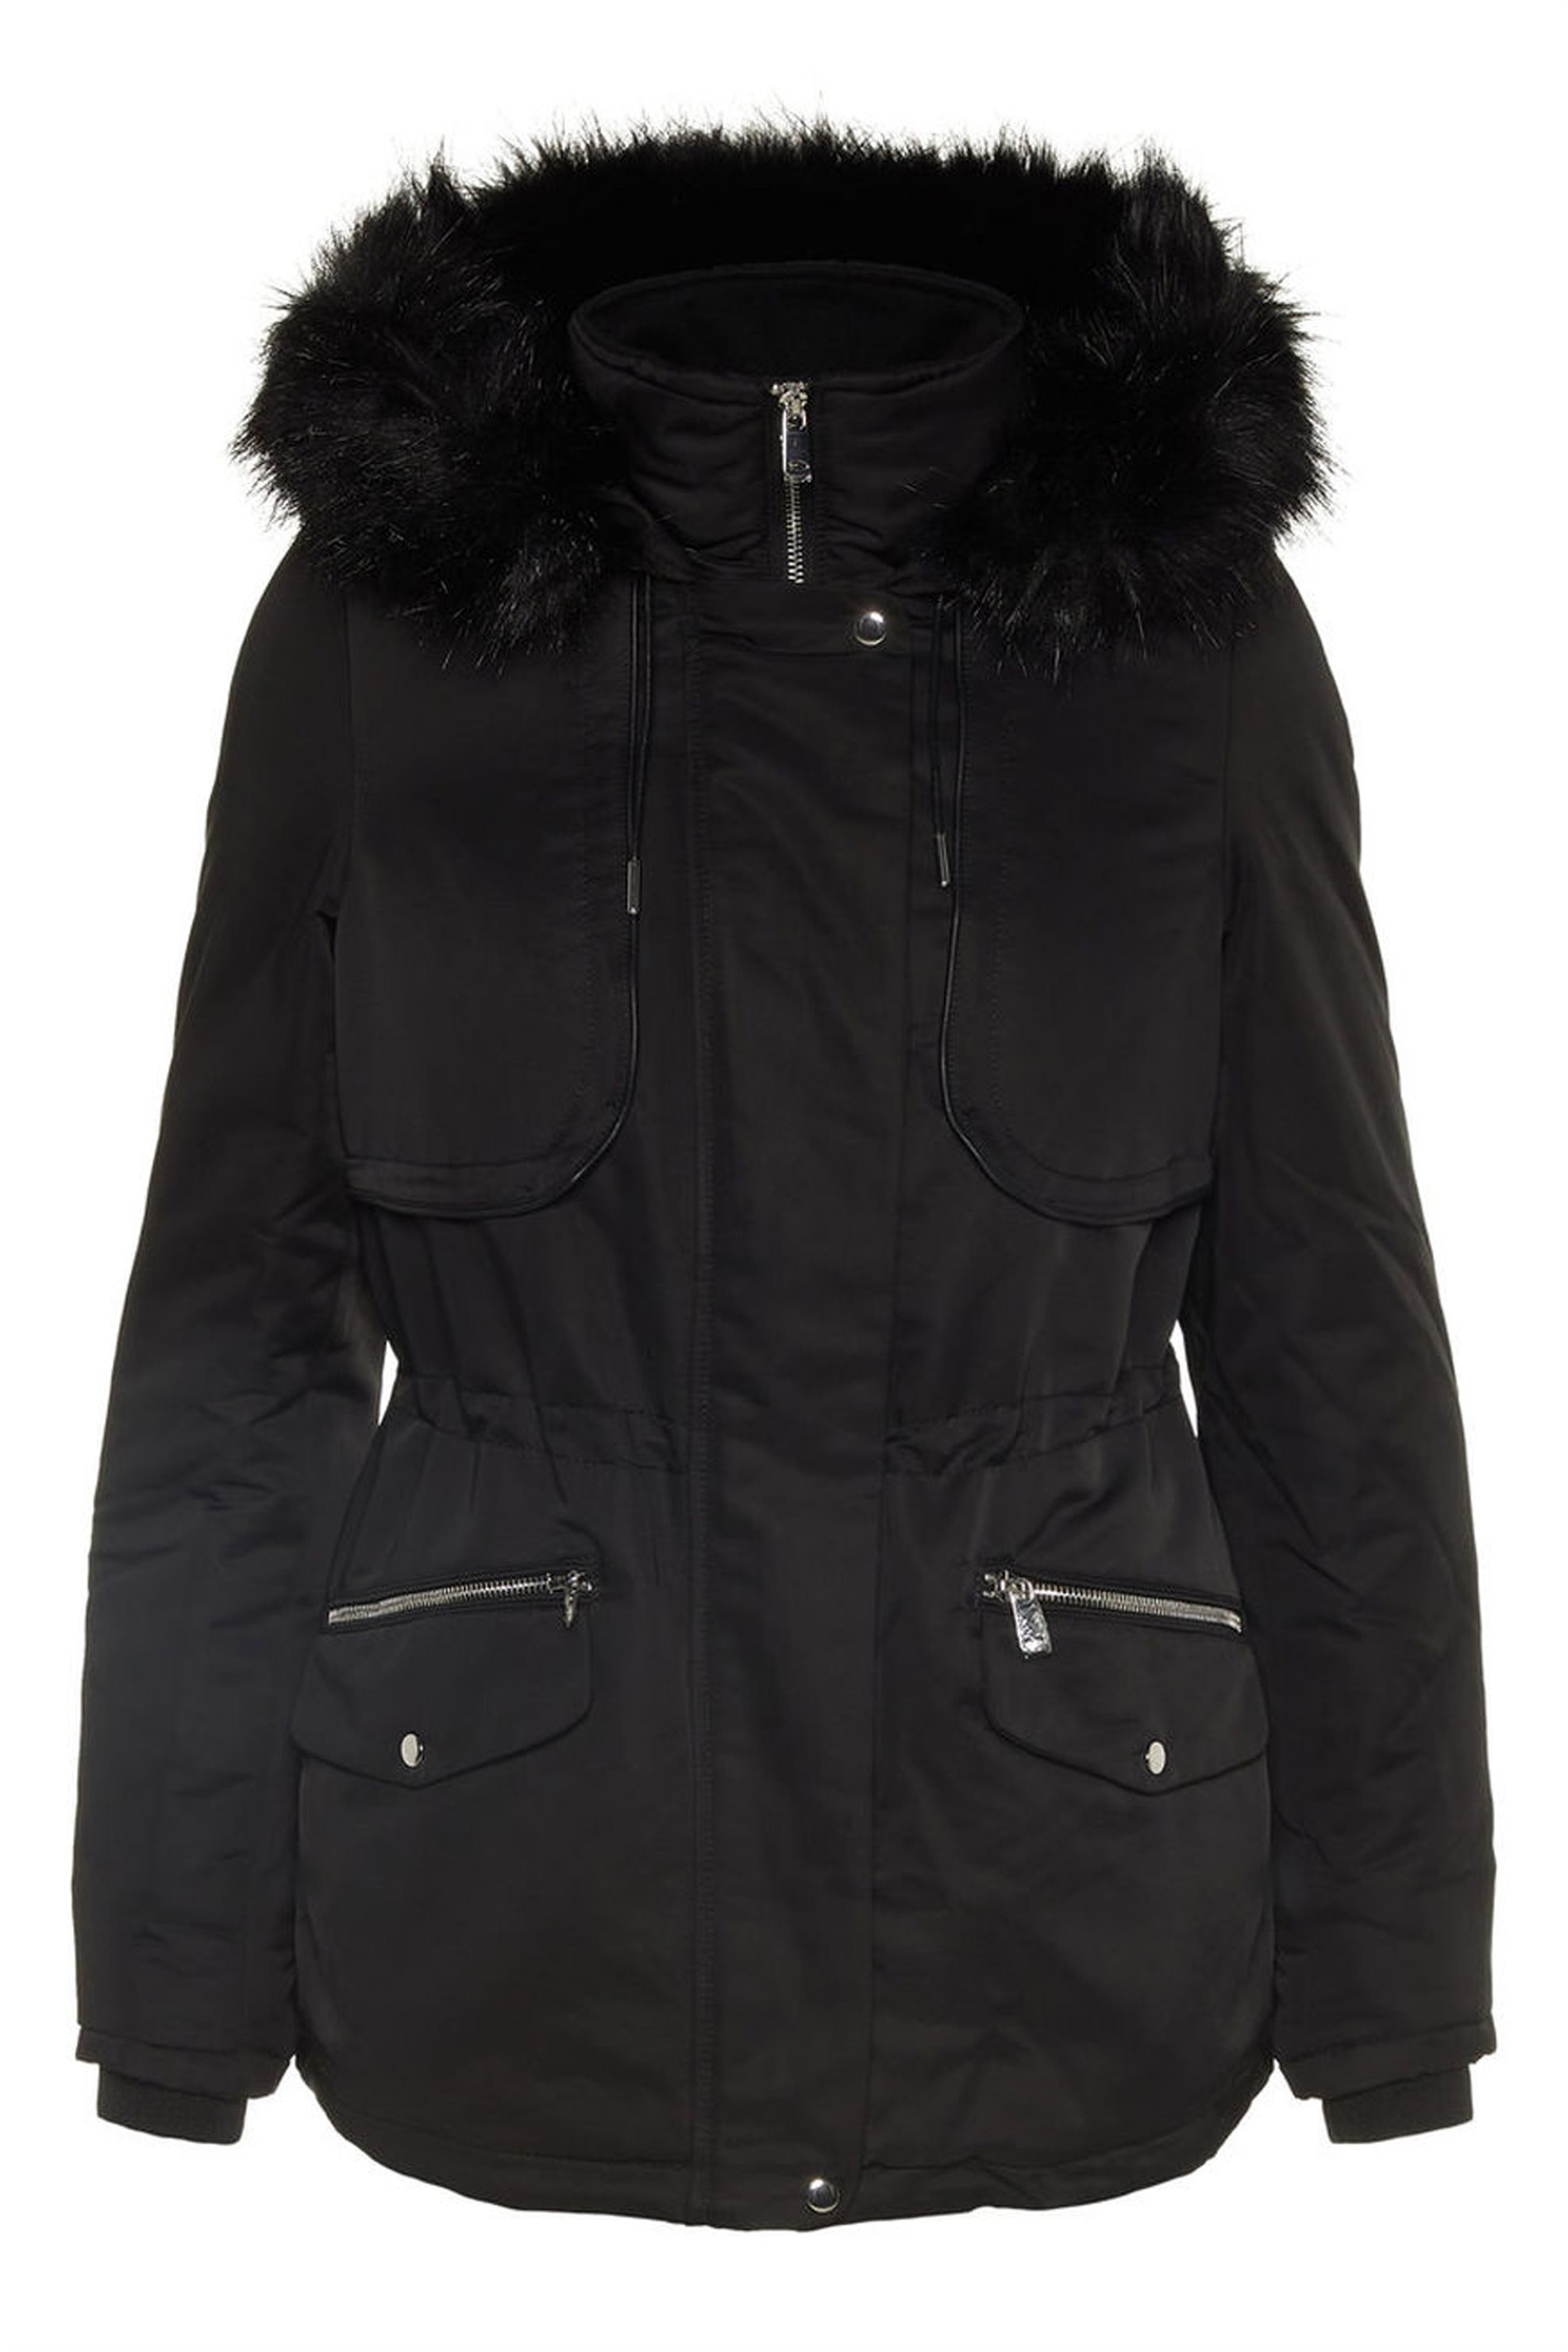 VERO MODA γυναικείο μπουφάν μαύρο με κουκούλα και faux γούνα - 10199088 - Μαύρο γυναικα   ρουχα   πανωφόρια   μπουφάν   σακάκια   μπουφάν